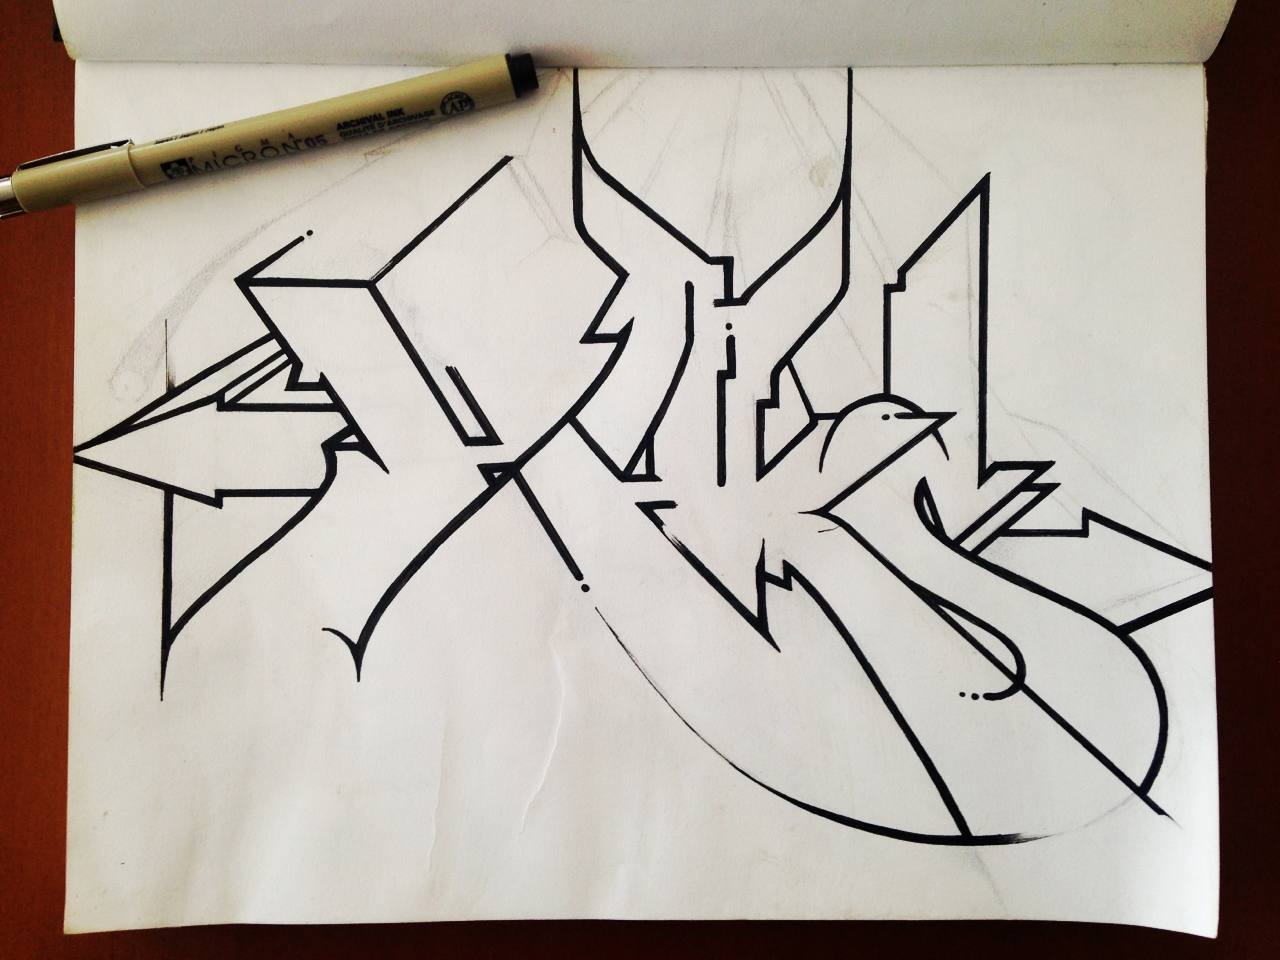 outlines_04.jpg